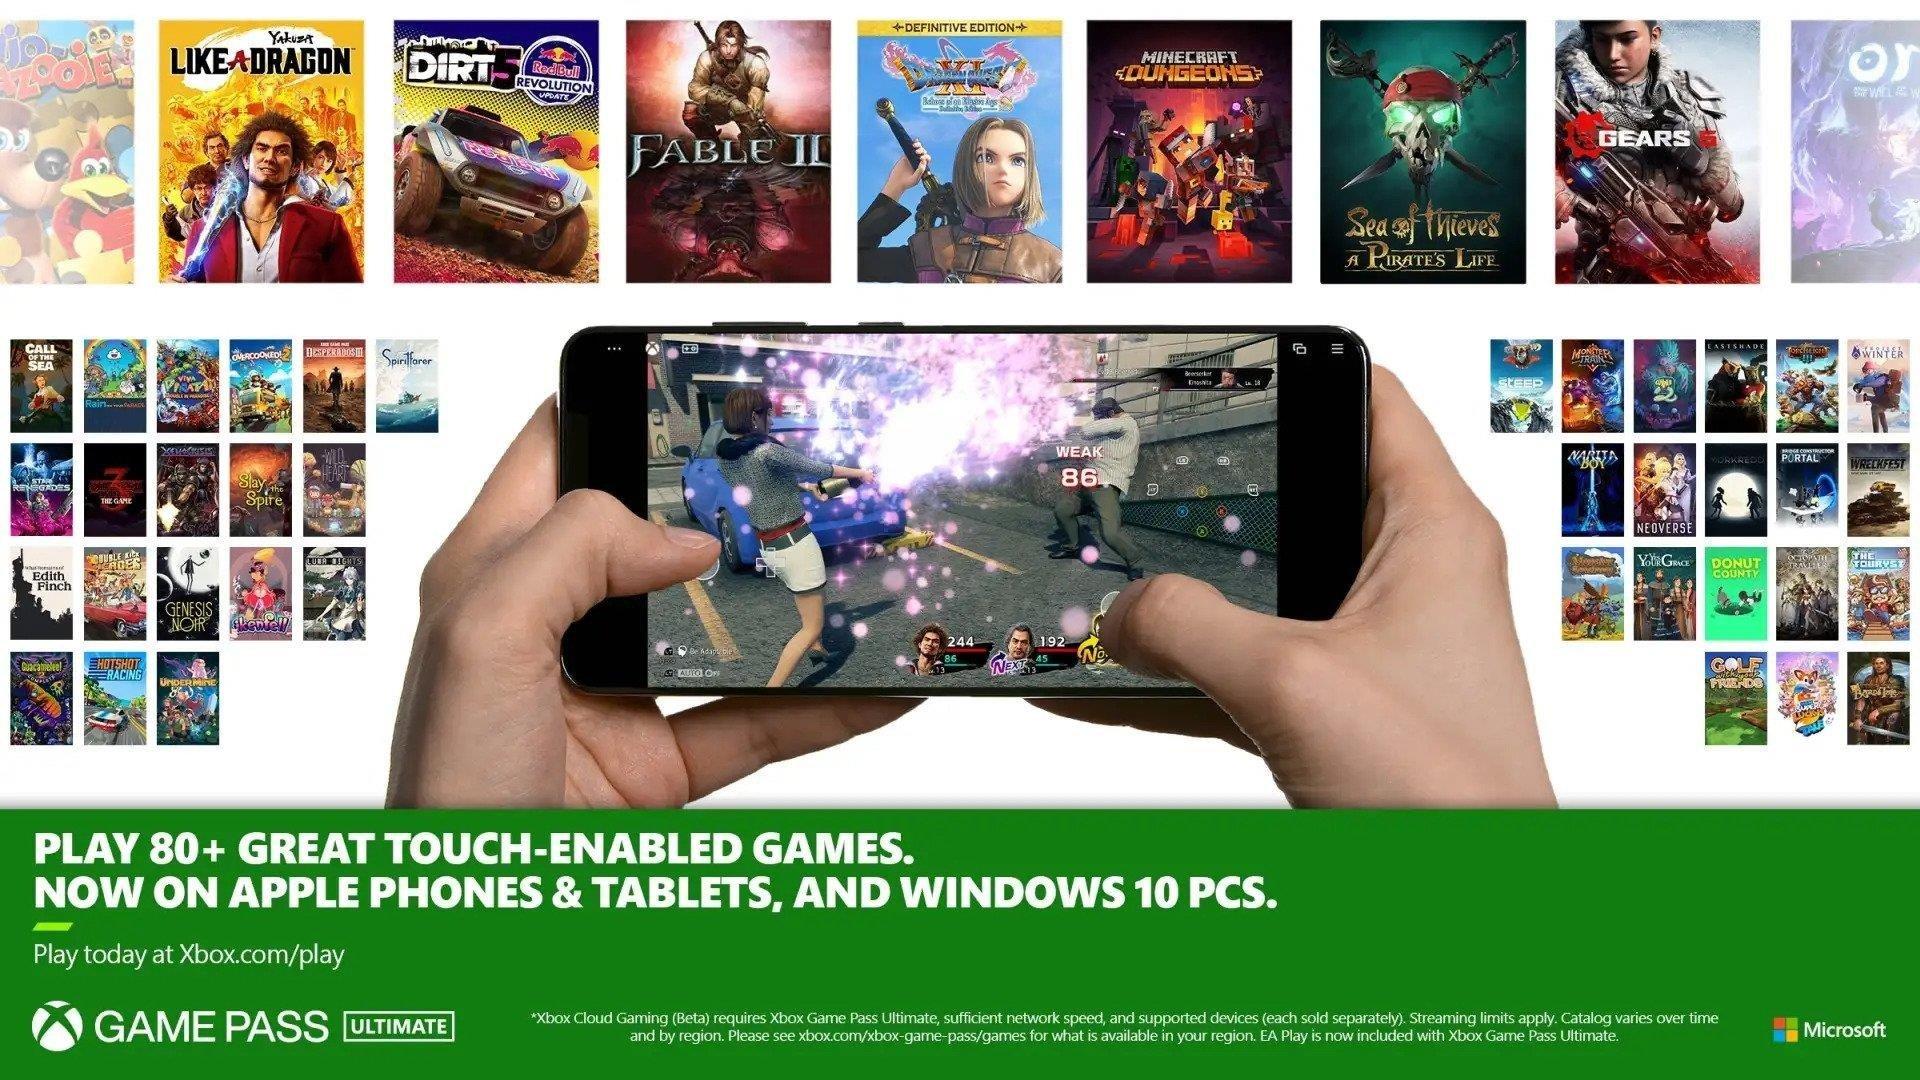 Controles táctiles para juegos en la nube de Xbox Xbox Game Pass Ultimate